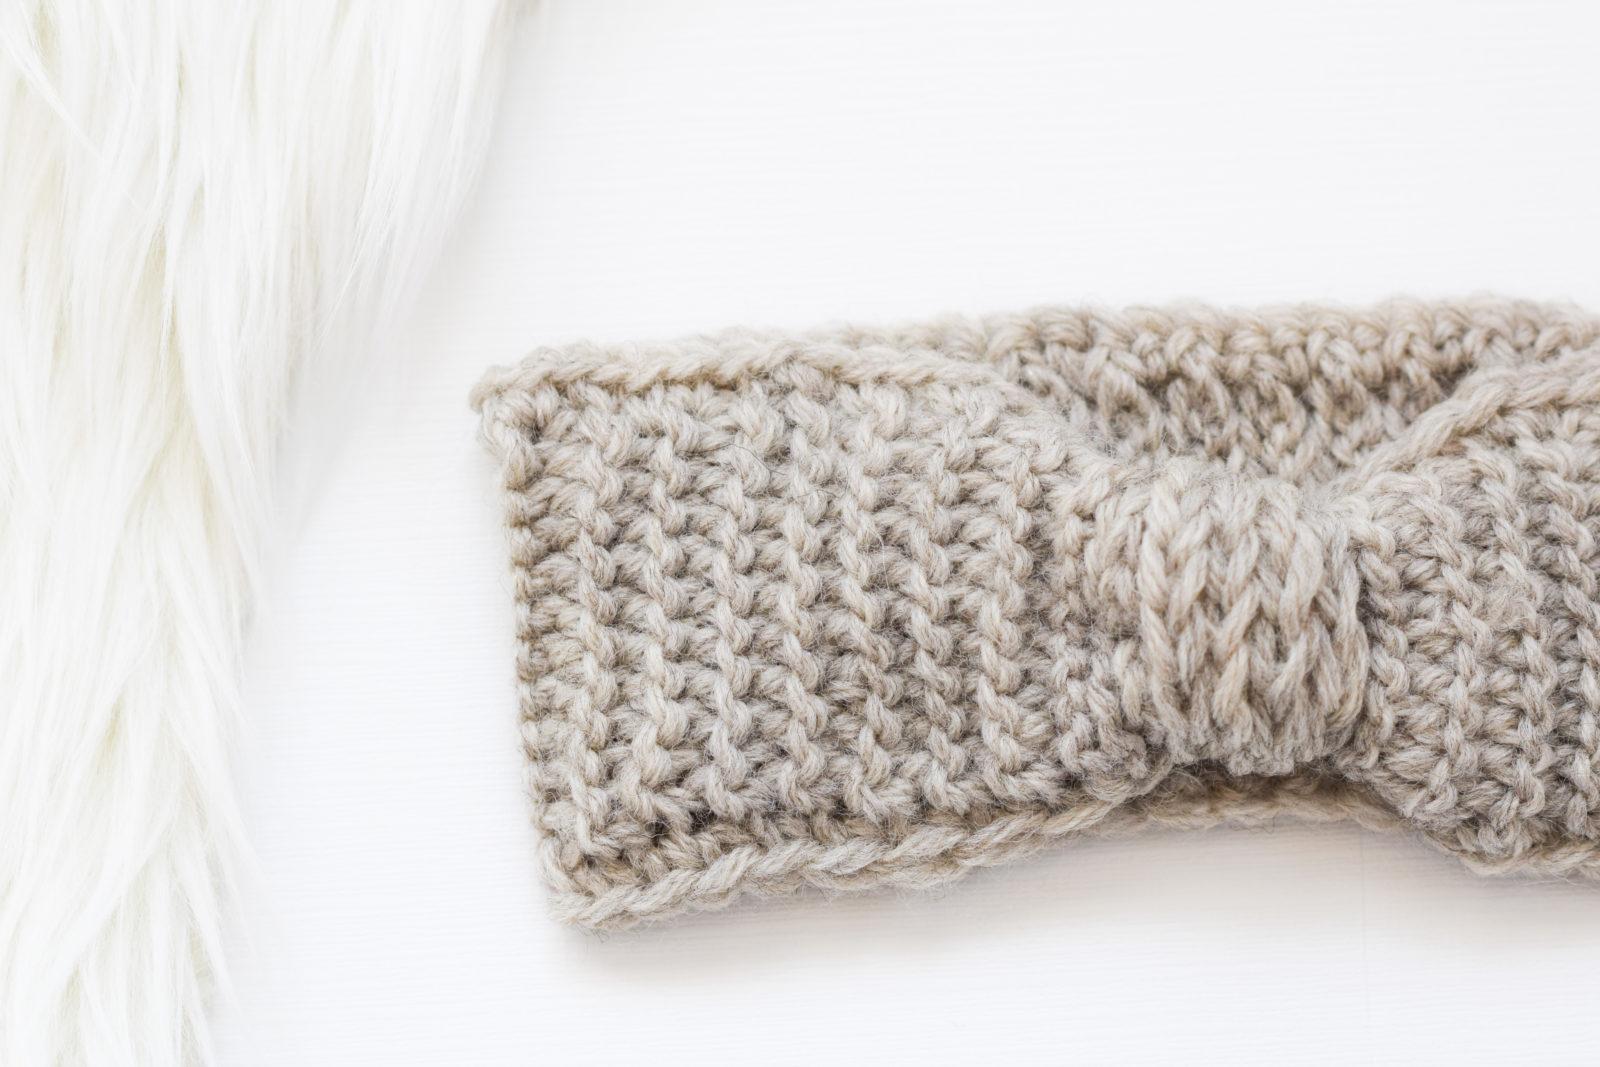 Crochet Headband Pattern Faux Purl – Mama In A Stitch